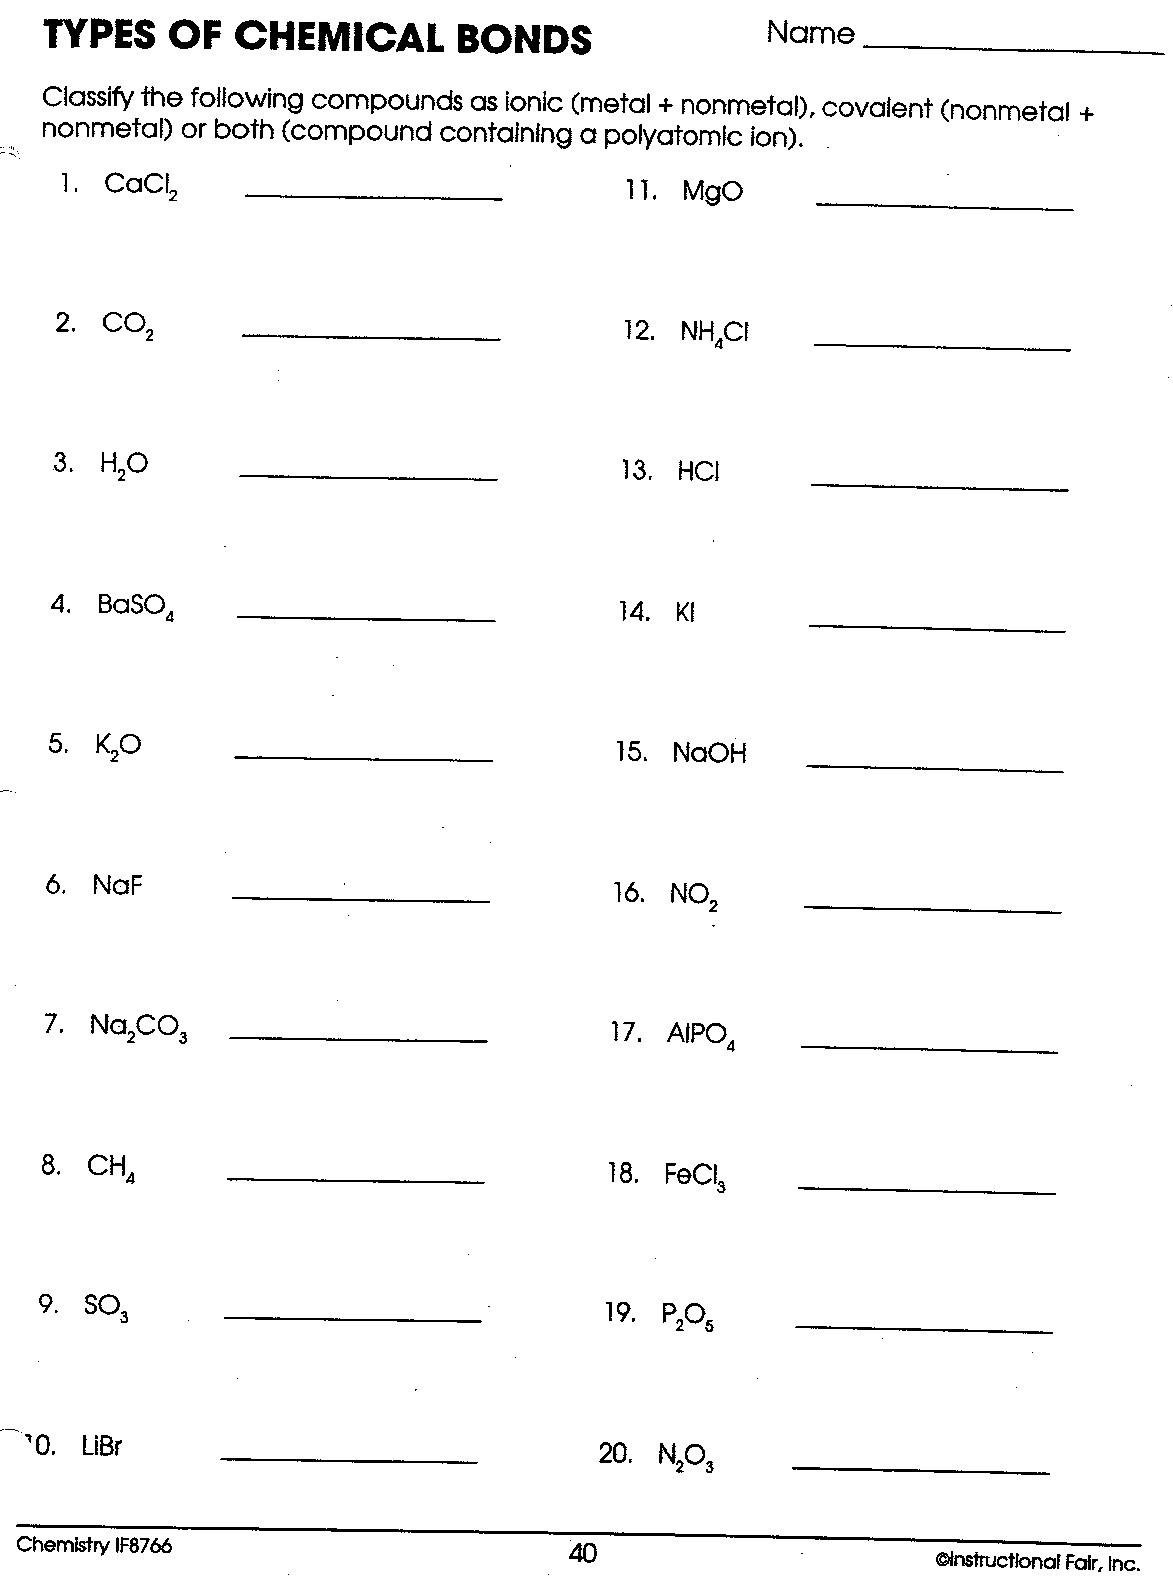 Ionic Vs Covalent Bonds Worksheets